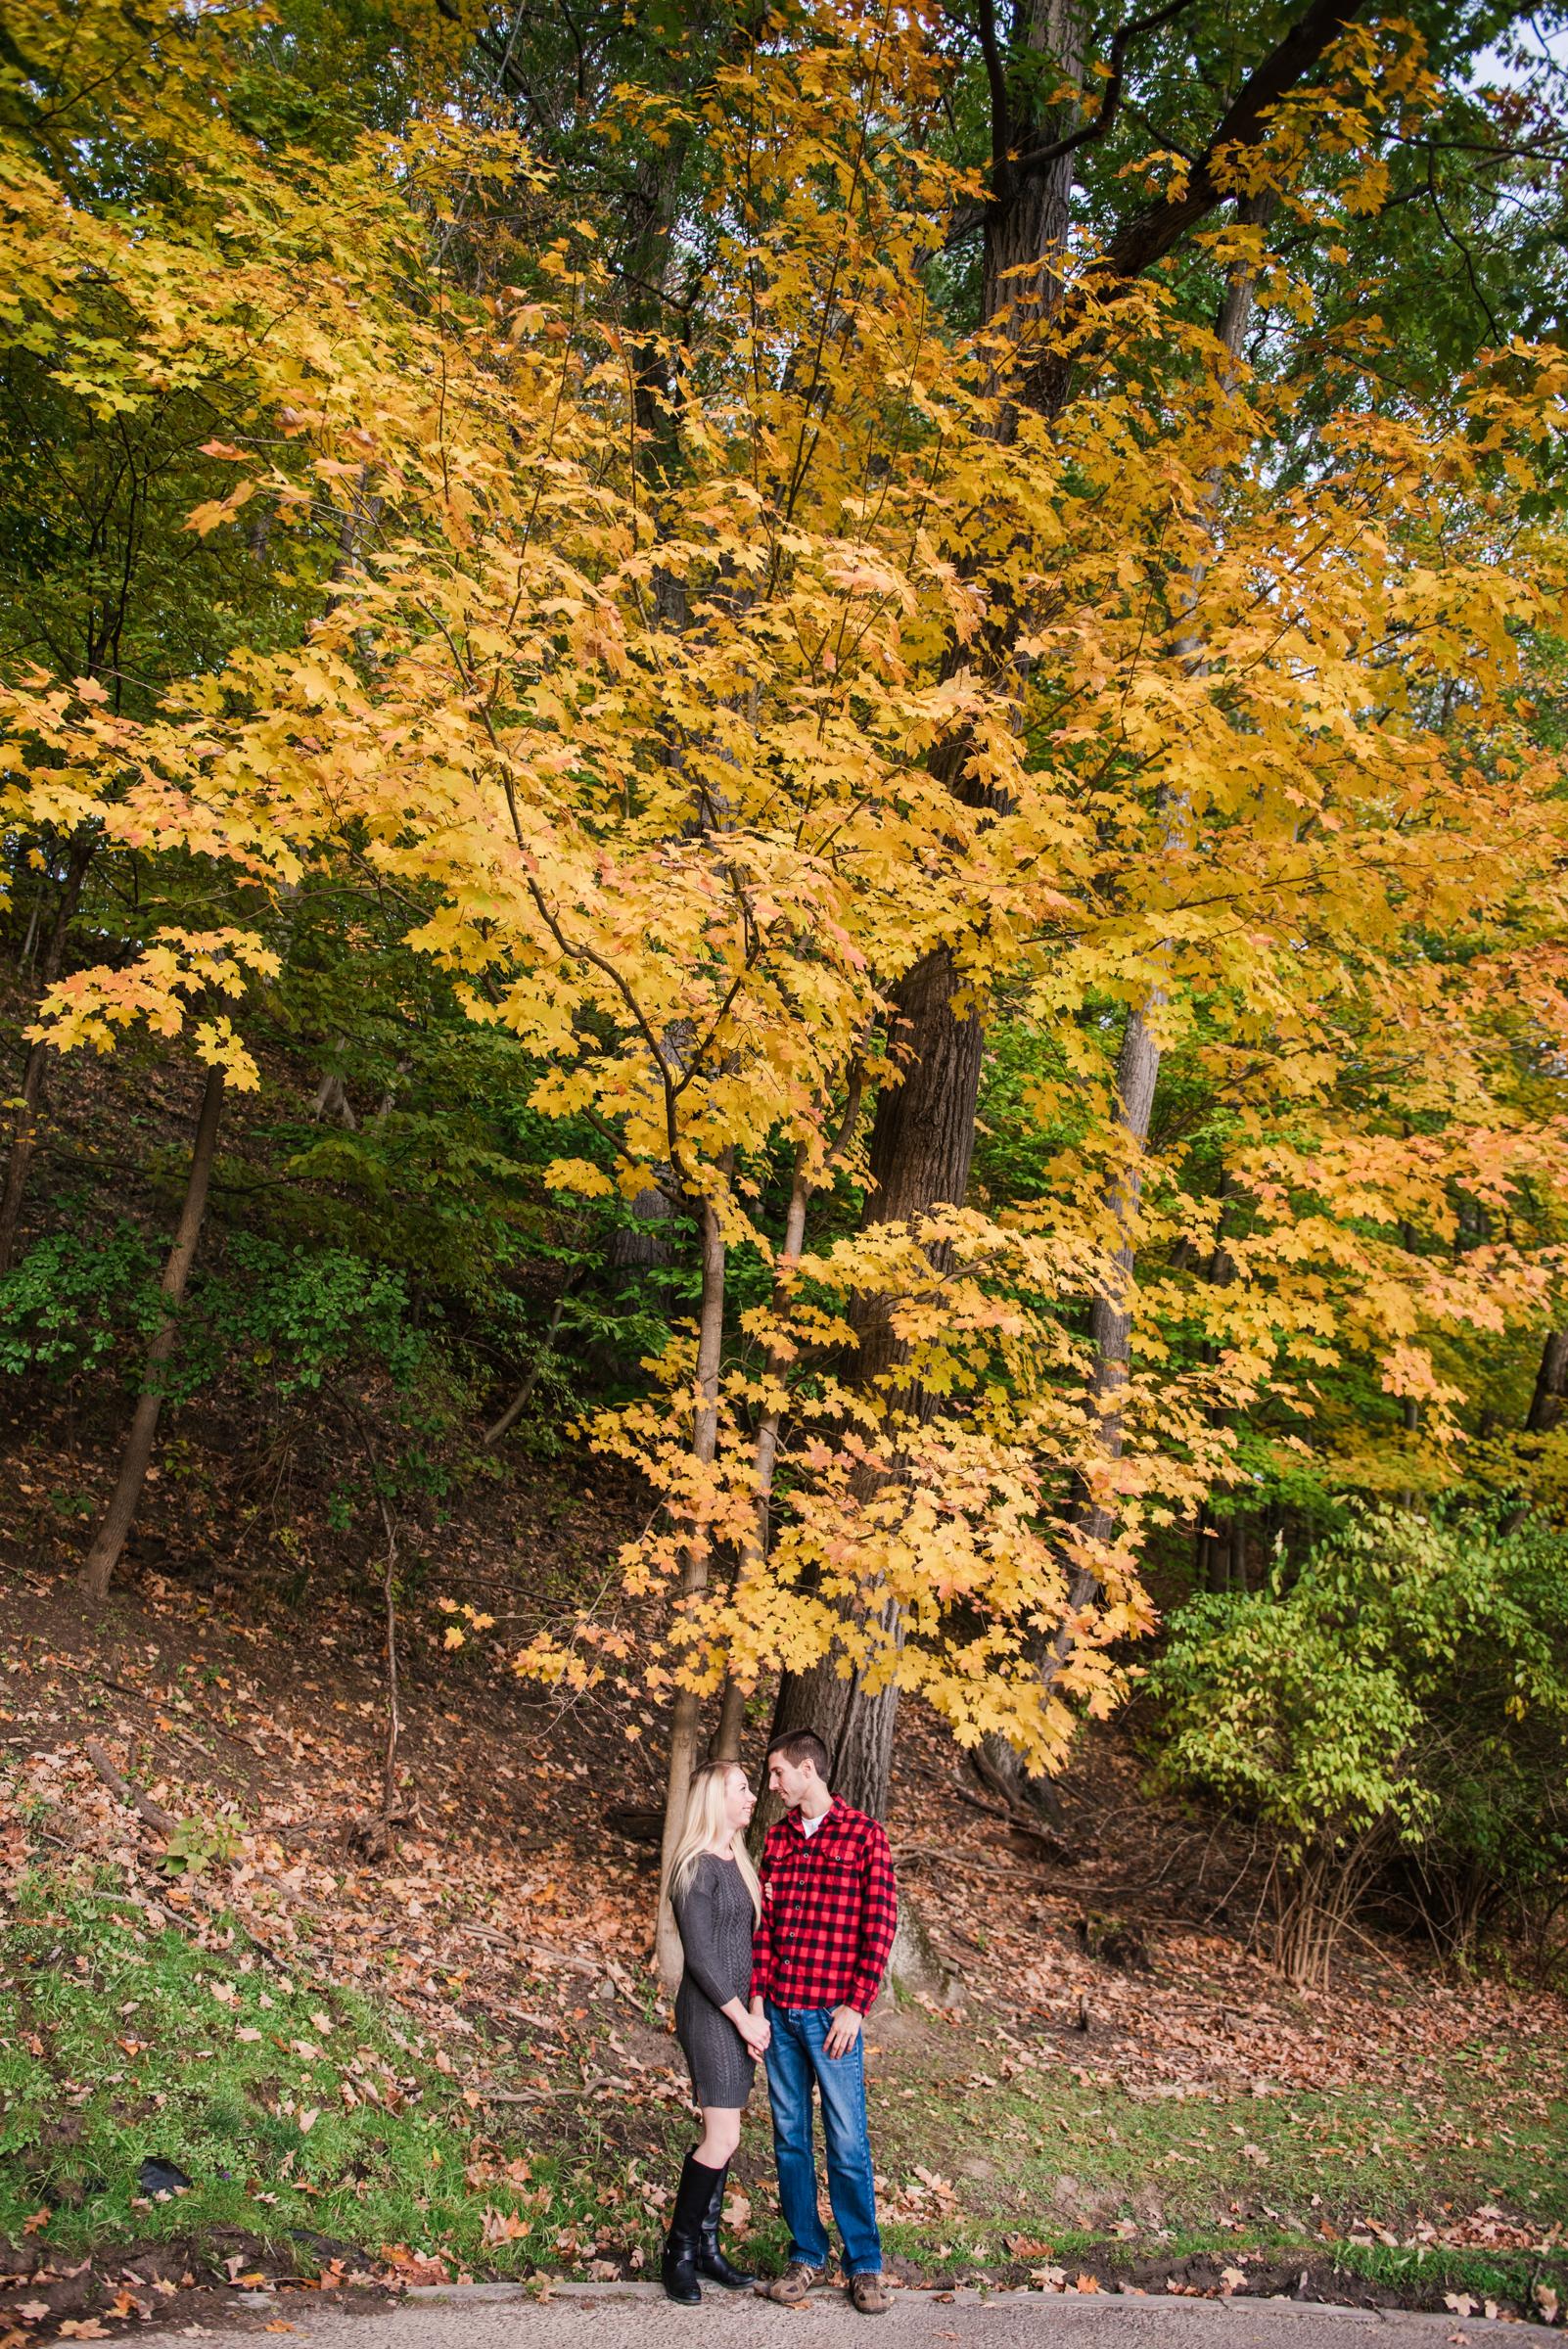 Letchworth_State_Park_Rochester_Engagement_Session_JILL_STUDIO_Rochester_NY_Photographer_DSC_6726.jpg